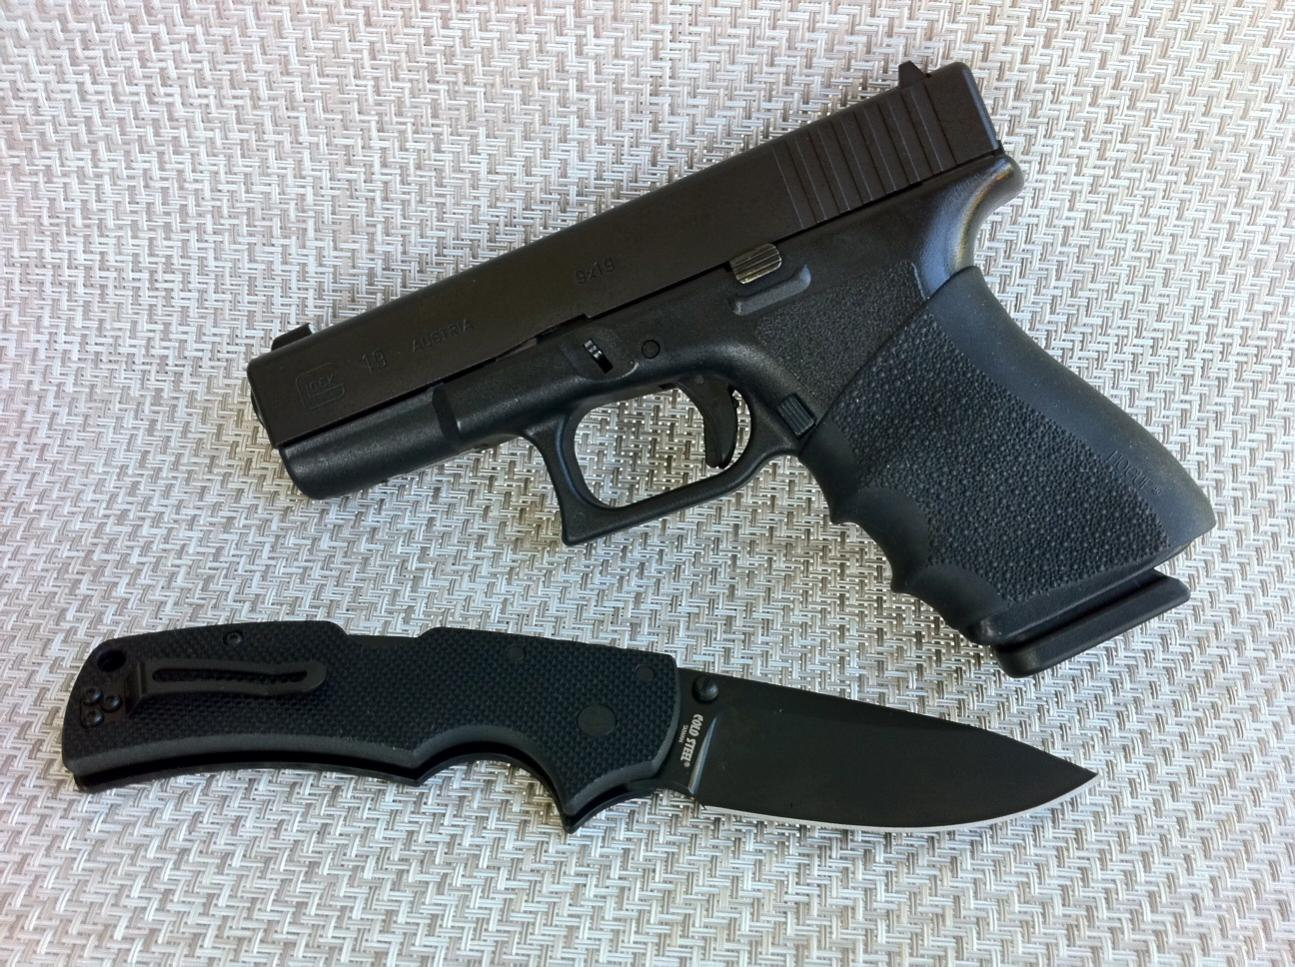 Your EDC Knife-photo.jpg